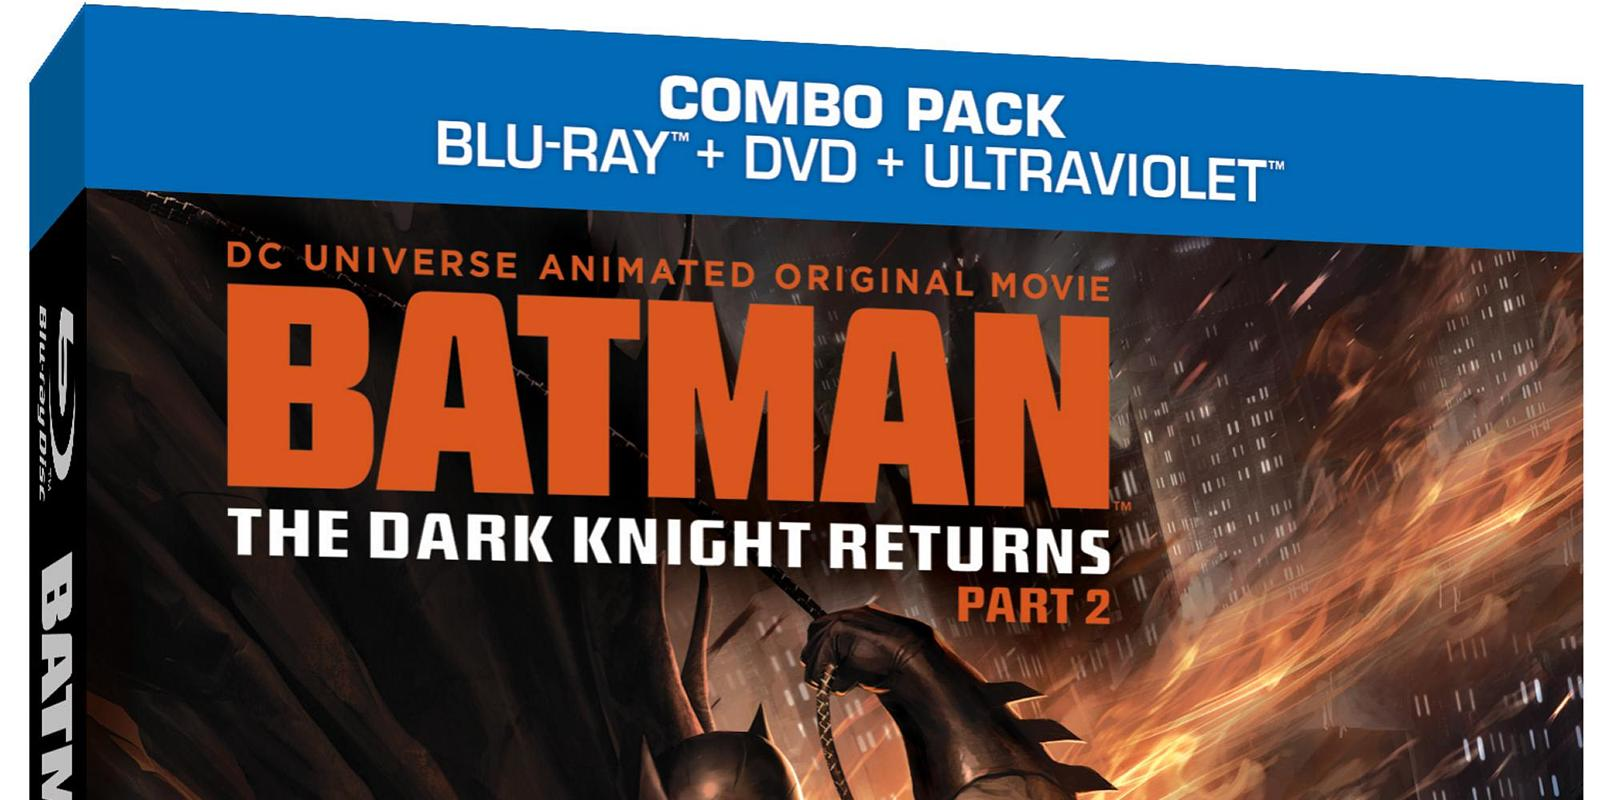 The dark knight release date in Sydney